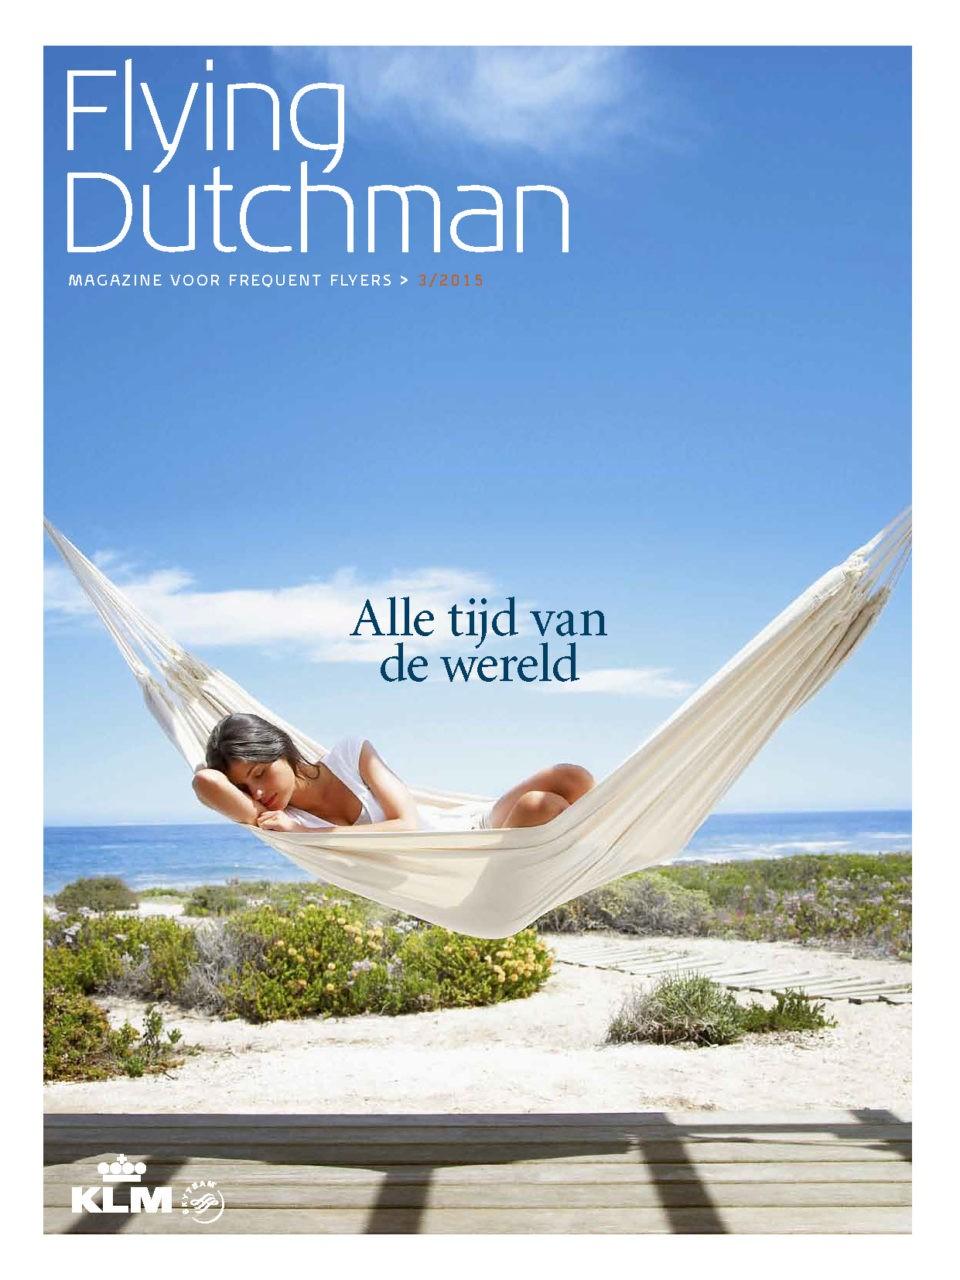 http://www.saota.com/wp-content/uploads/2018/01/SAOTA_ARRCC_OKA__NL_KLM-The-Flying-Dutchman_Silver-Bay-Villa_Wereldnieuws-cover.jpg